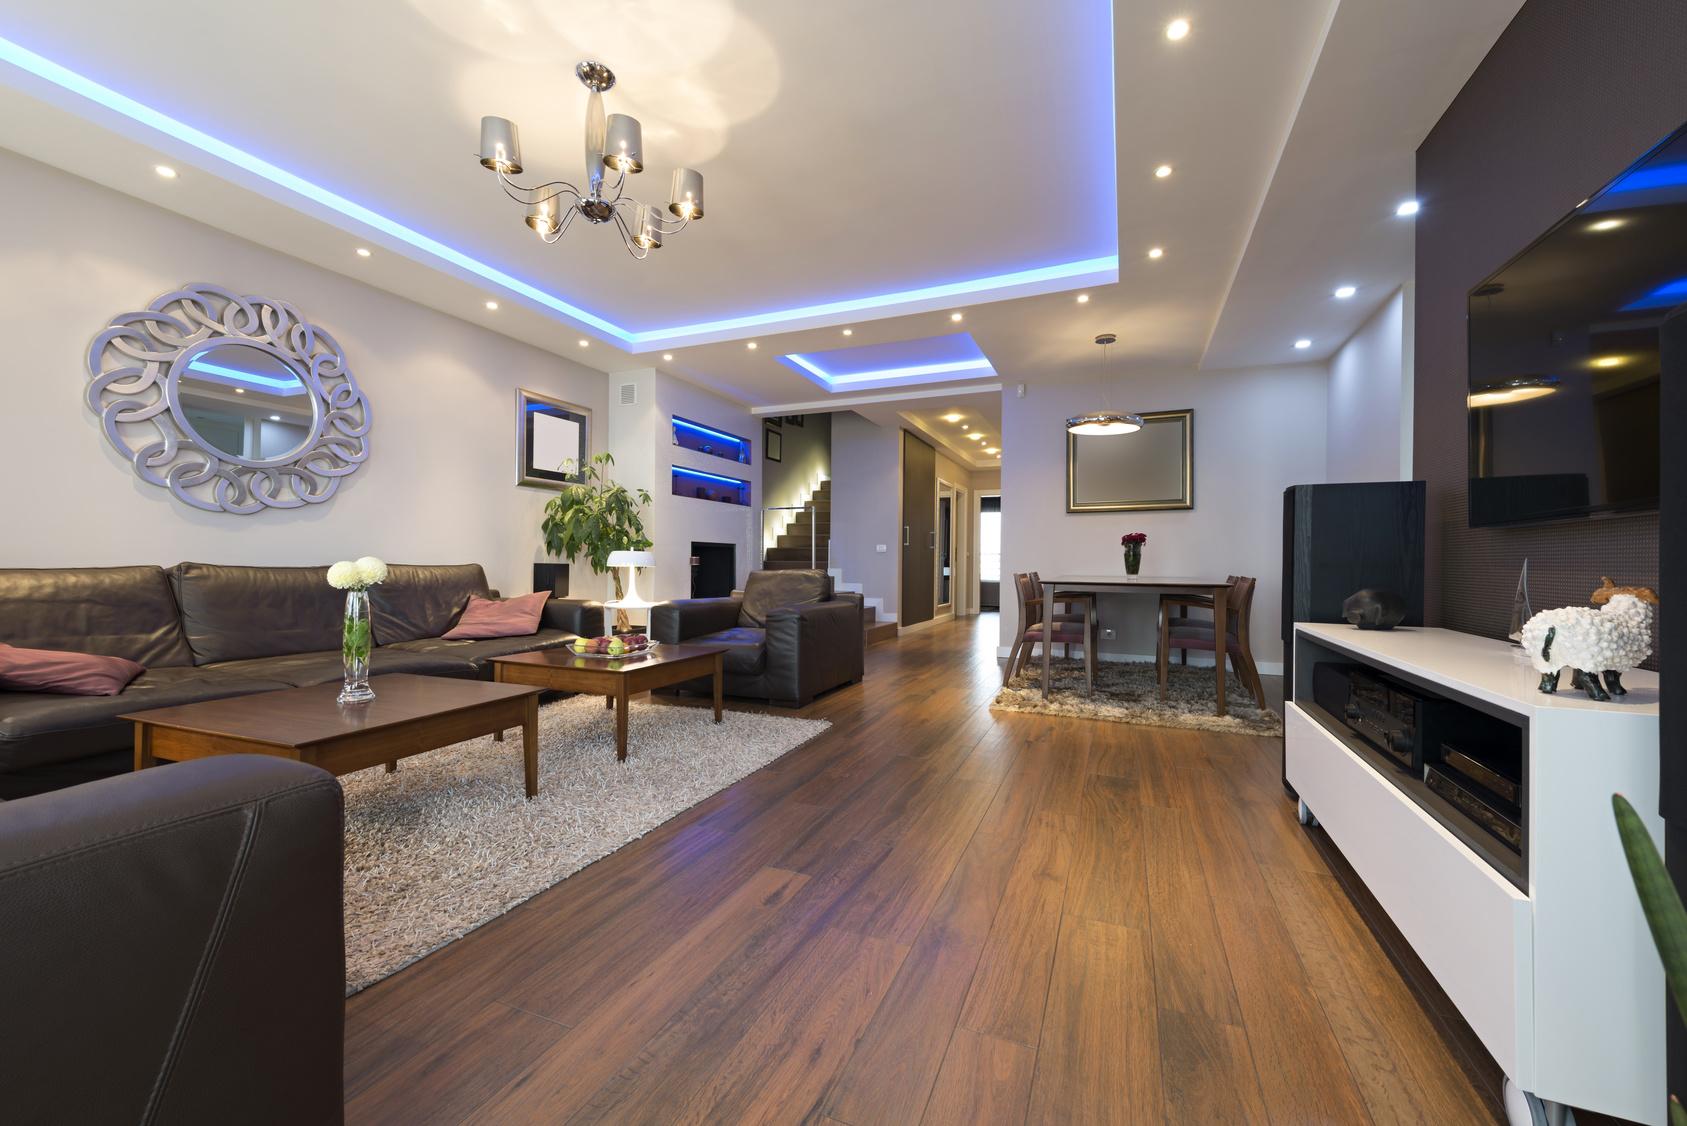 Reasons to install luxury lighting